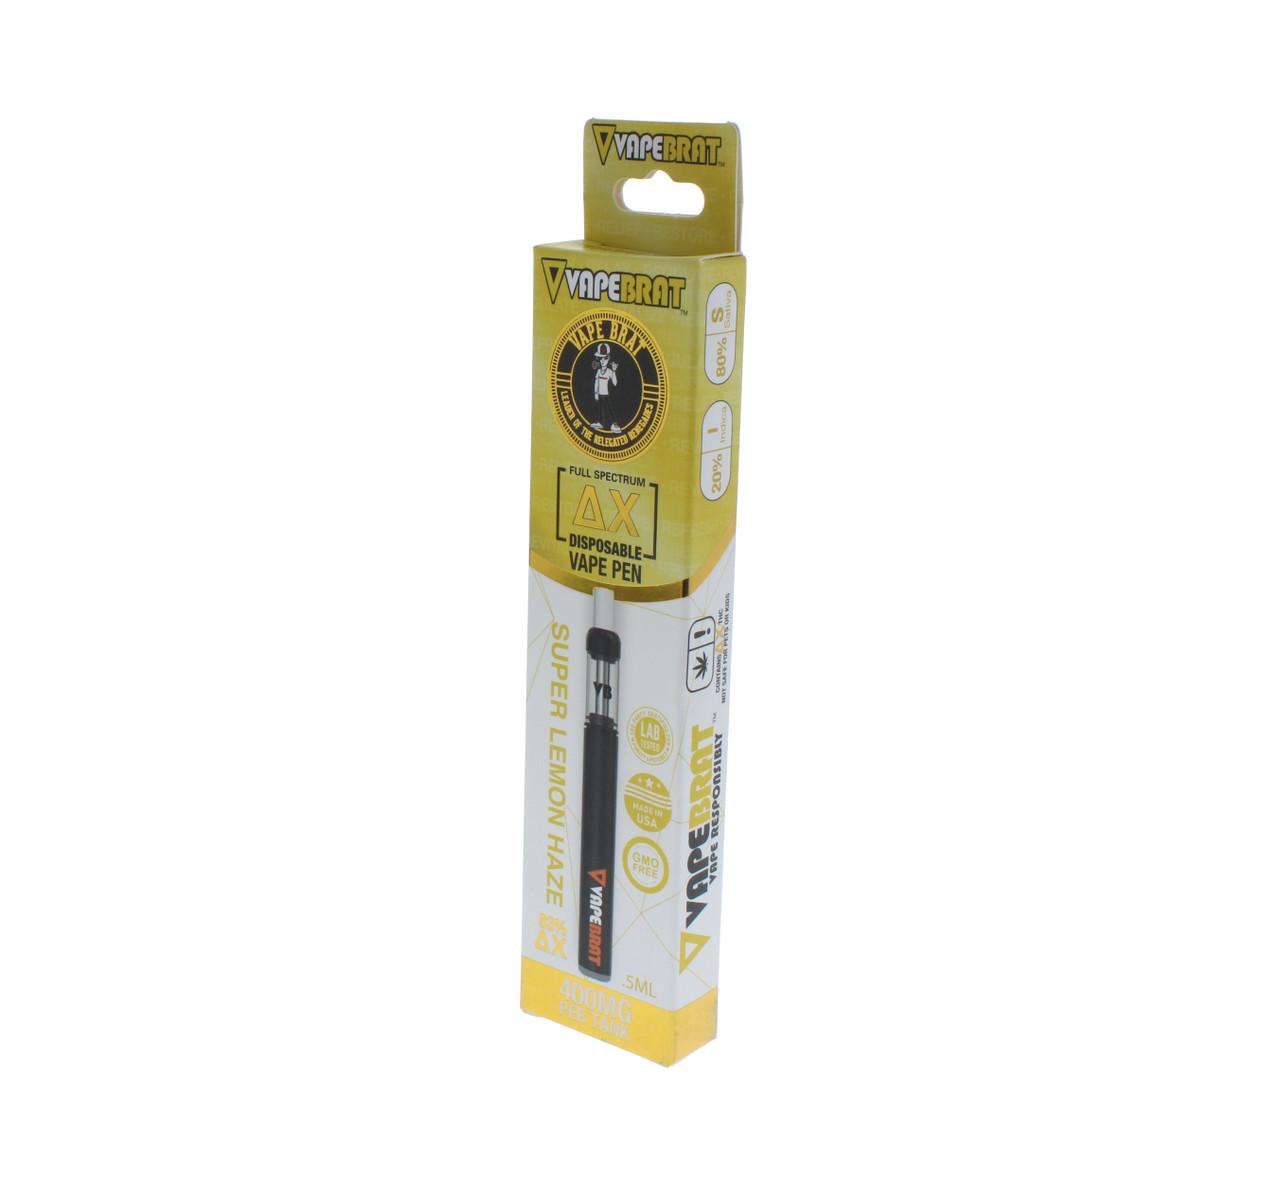 VapeBrat Disposable Delta X Vape Pen: Super Lemon Haze 400mg